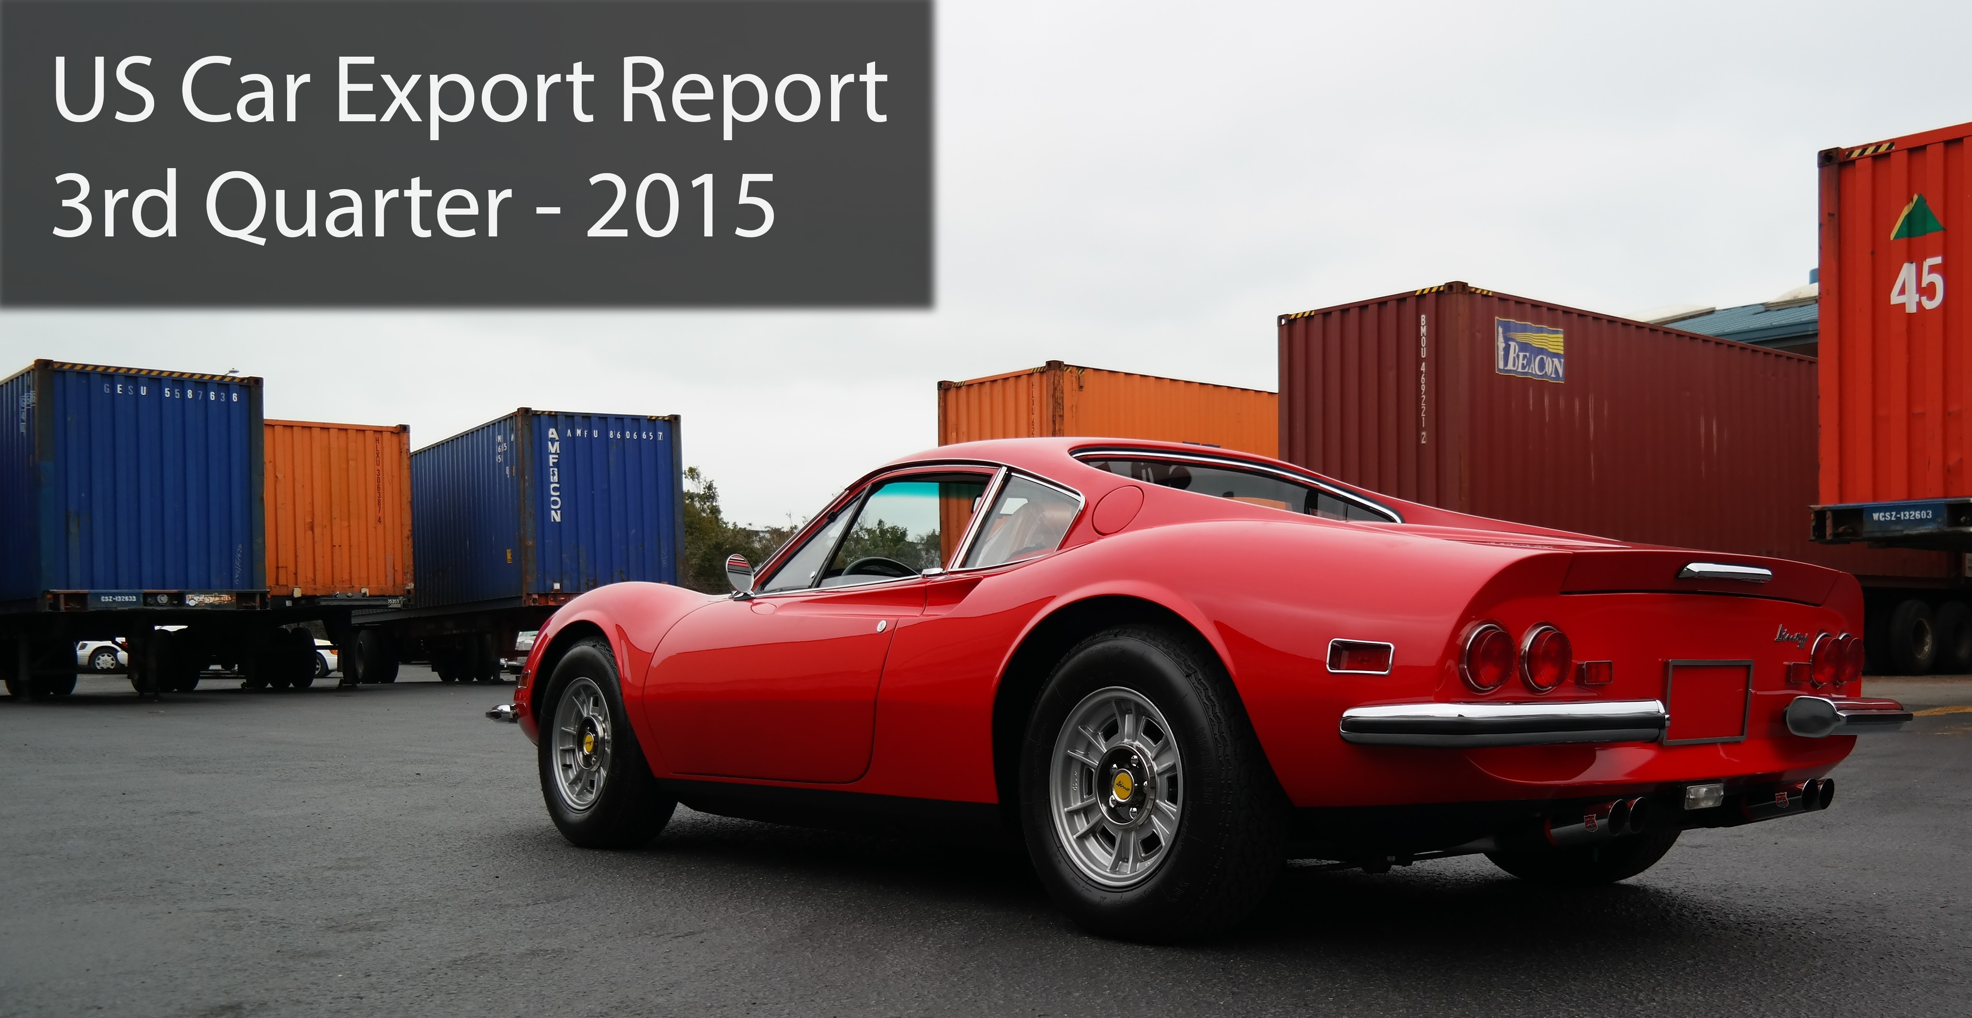 International Car Shipping Top Destinations 2015 Q3